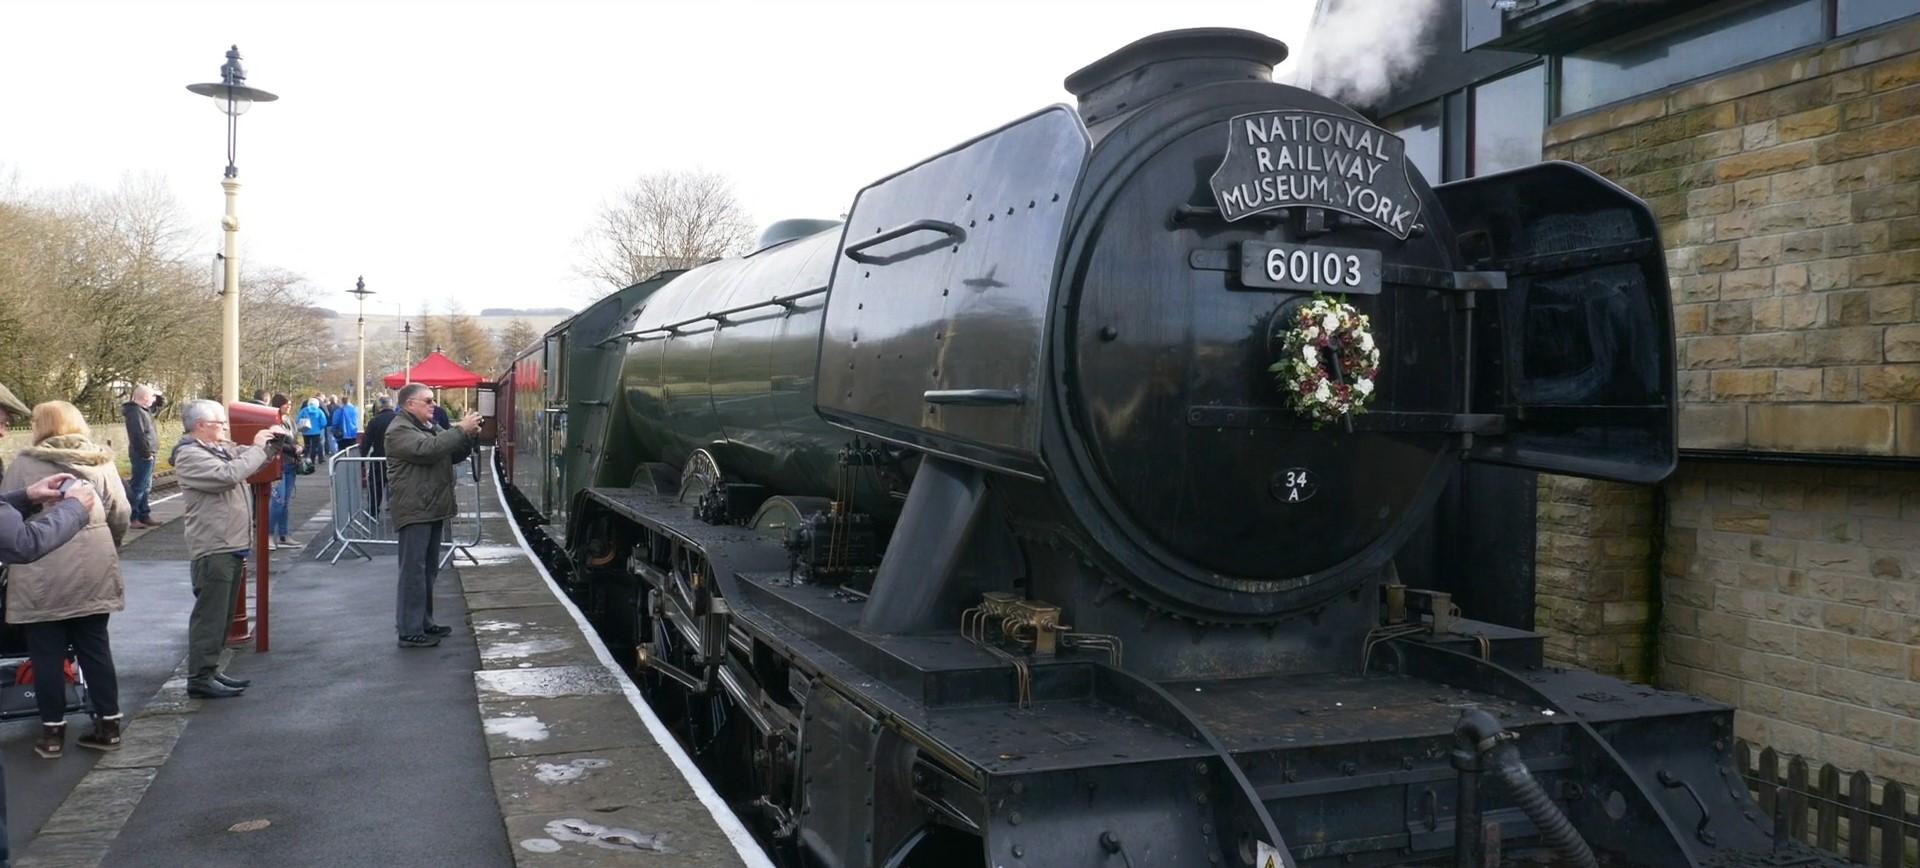 Close up of train on East Lancashire Railway